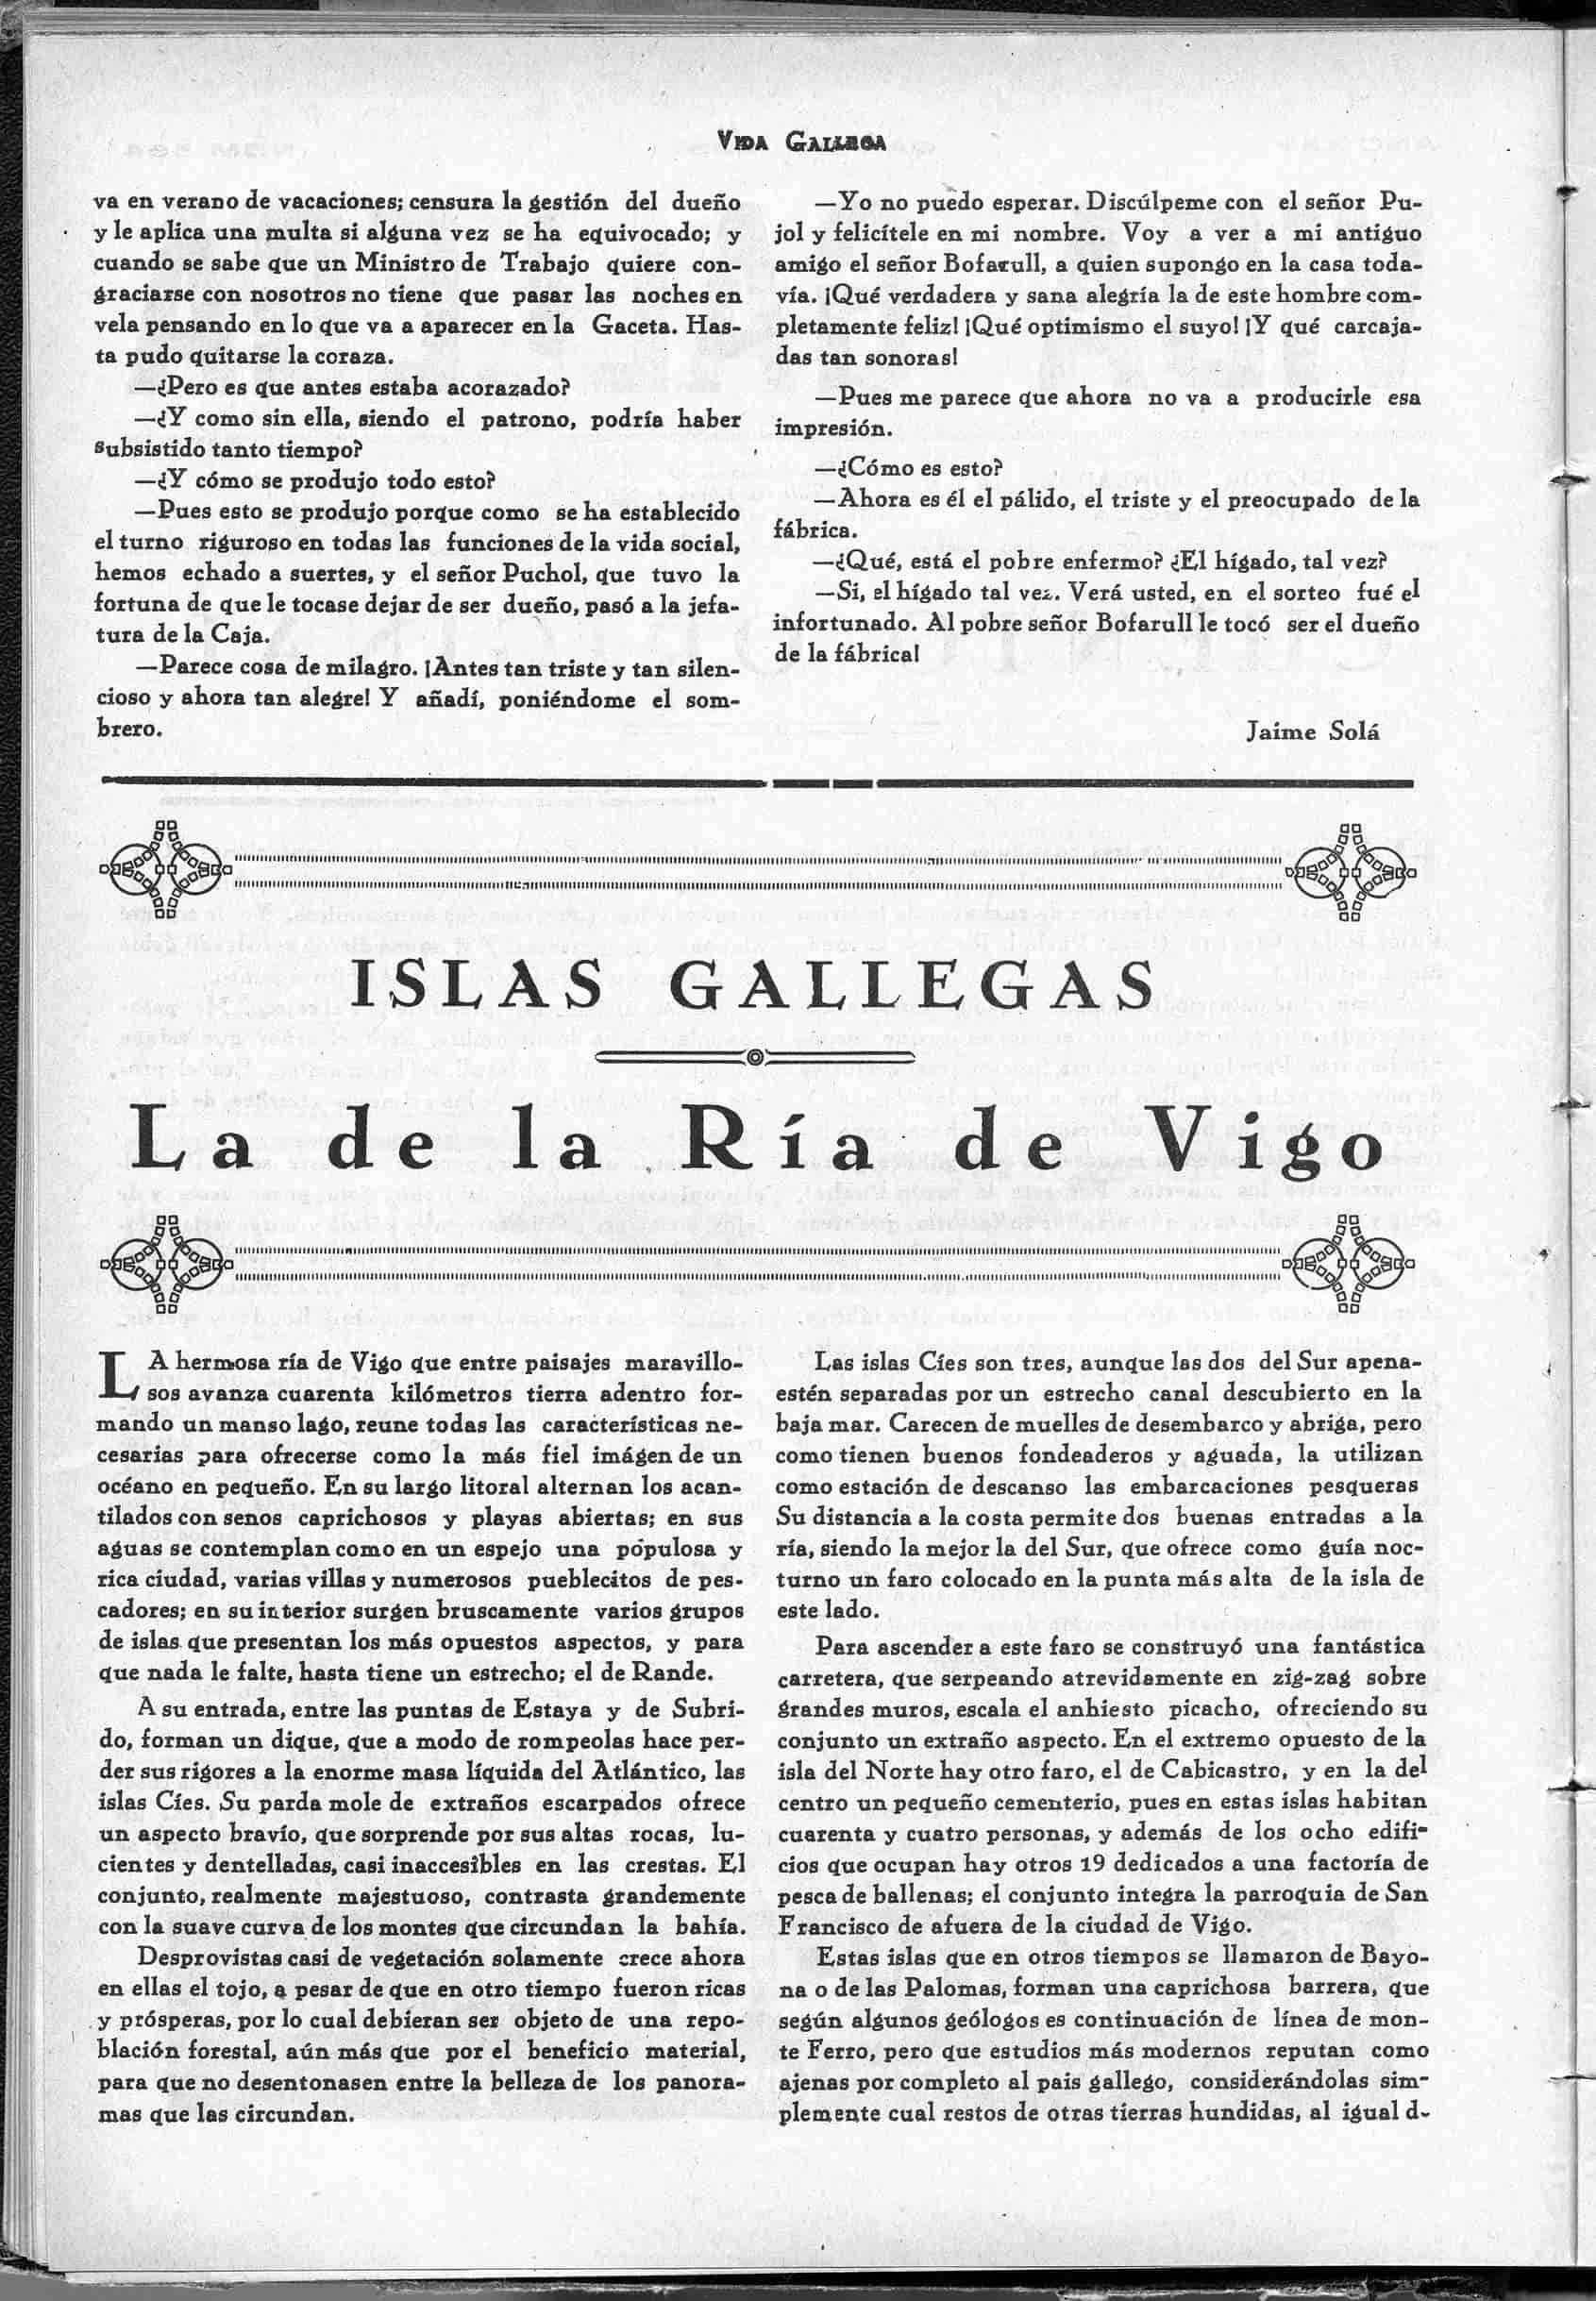 islas gallegas